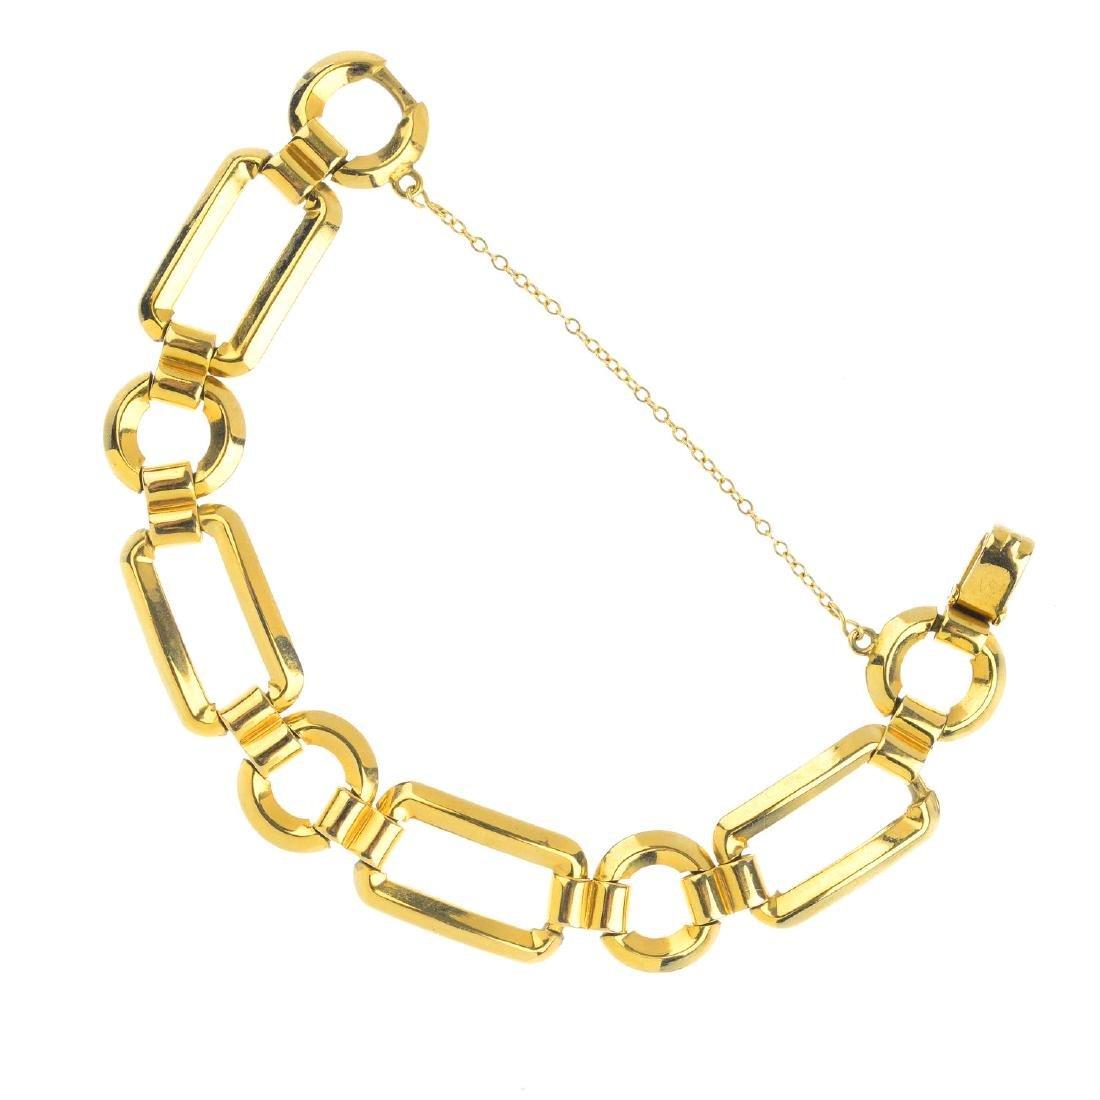 A bracelet. Of openwork design, the alternating series